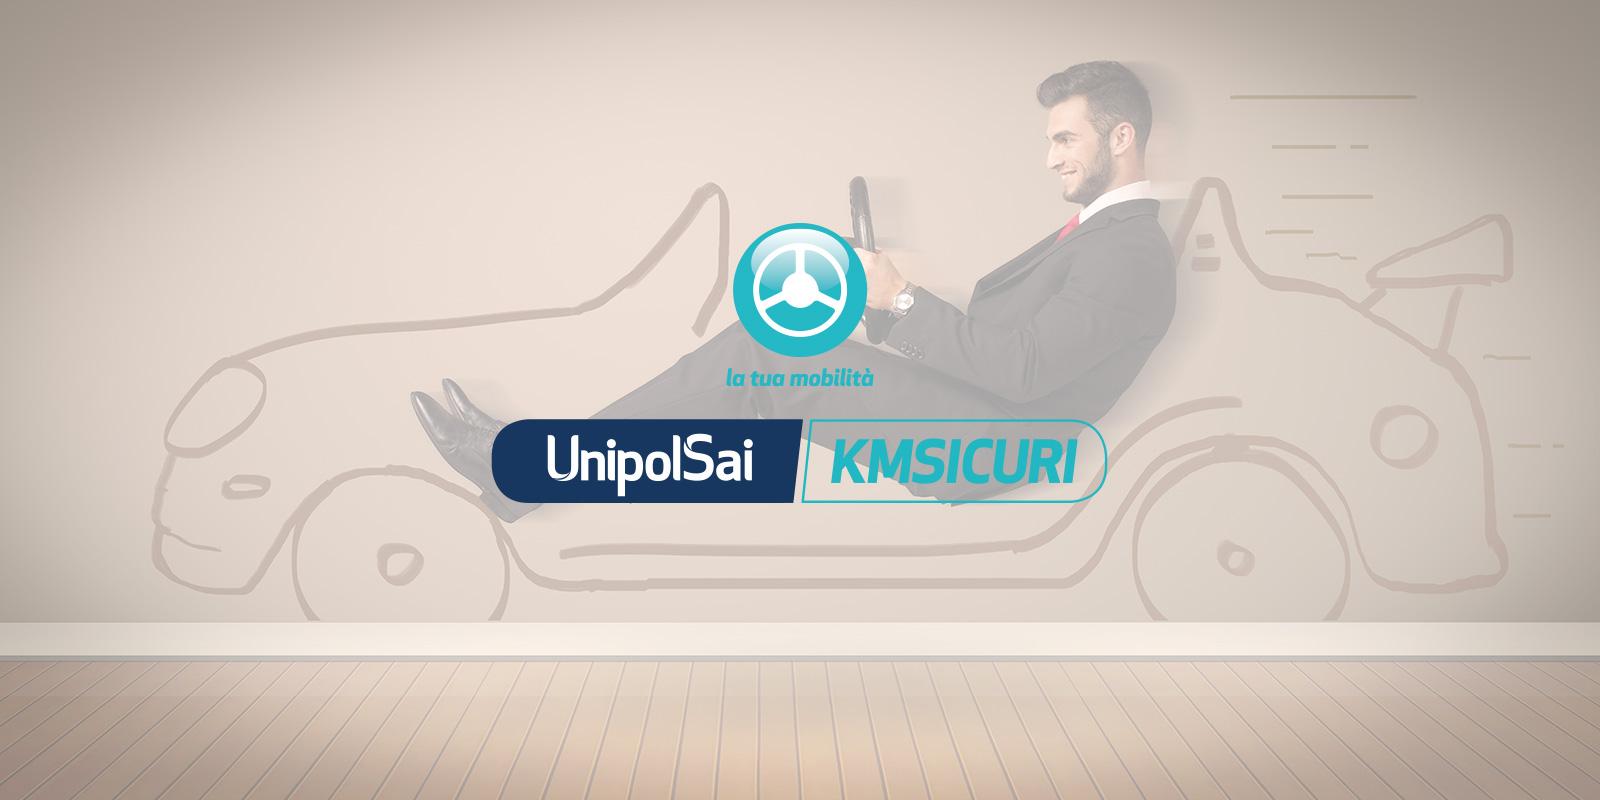 UnipolSai-KMSICURI